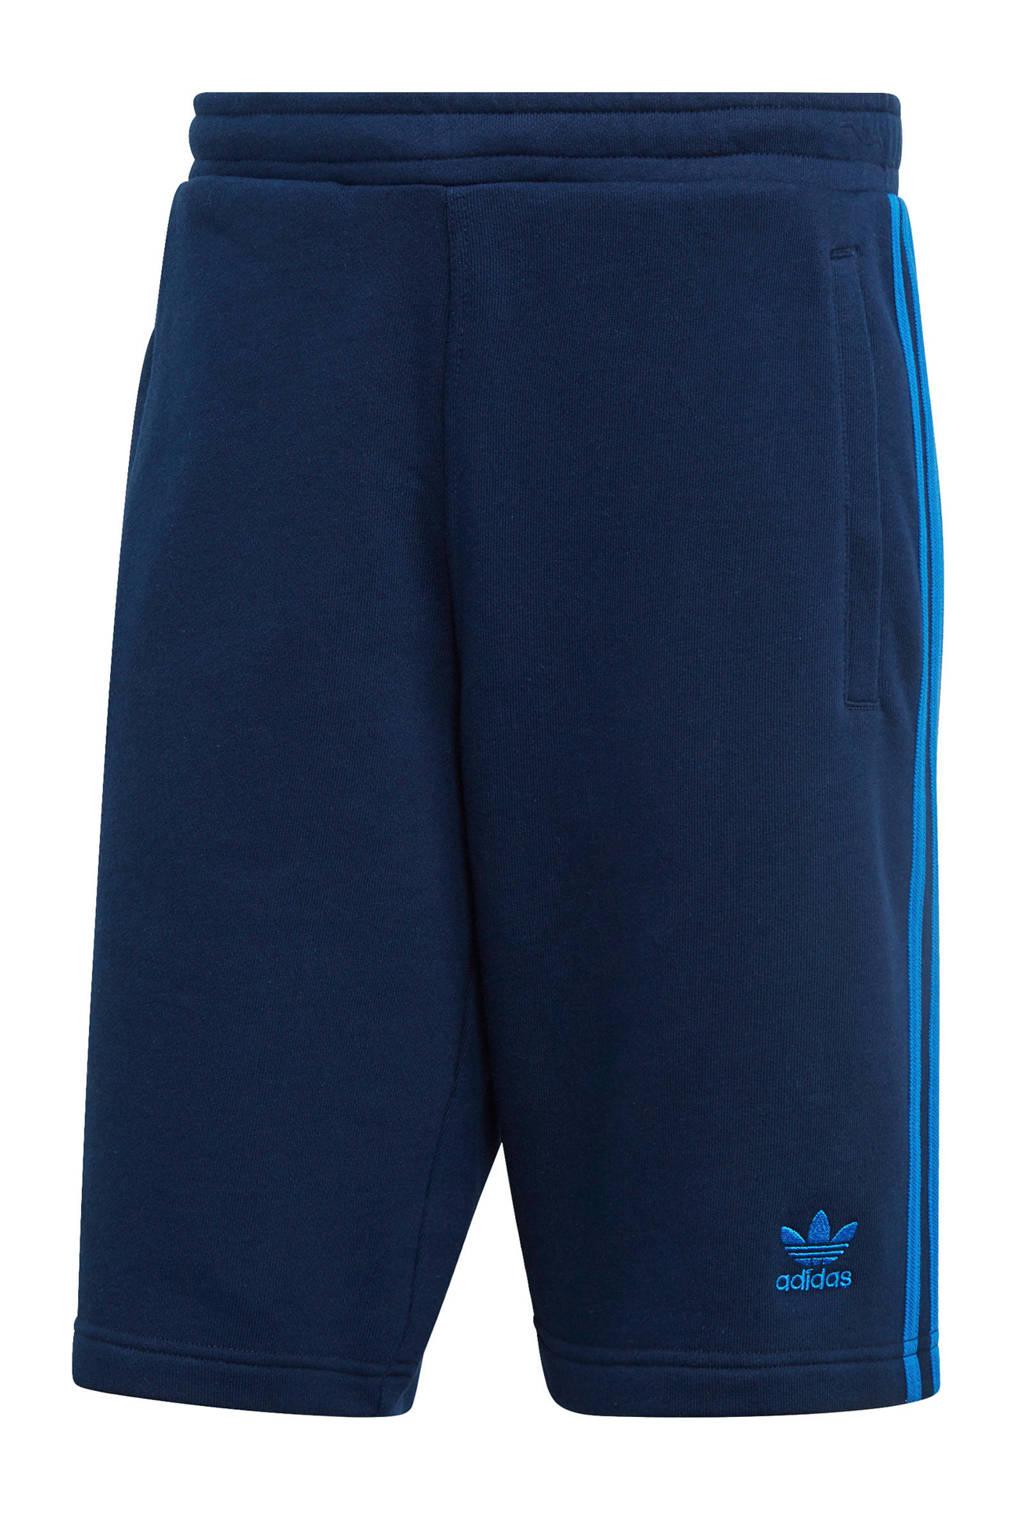 adidas originals   Adicolor sweatshort donkerblauw, Donkerblauw/blauw